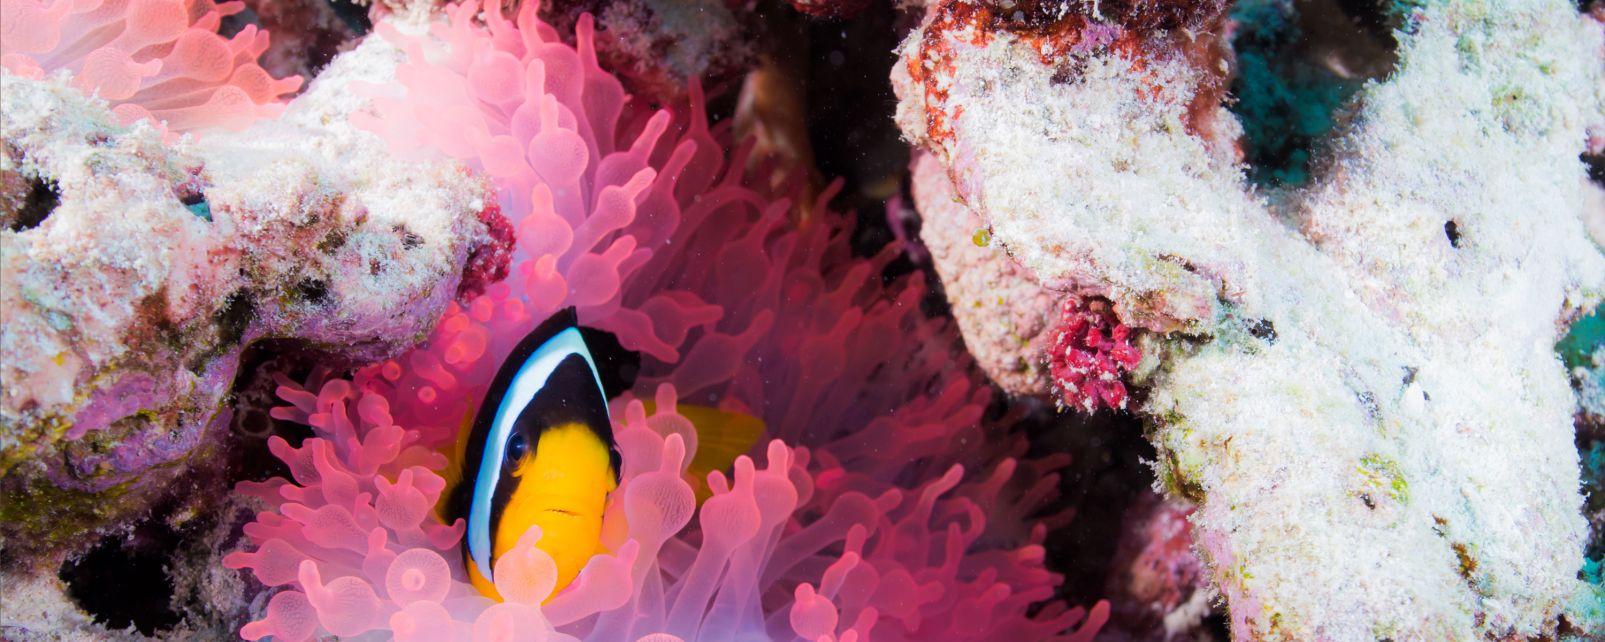 La plongée, Oman, oman dive center, plongée, faune, sous-marine, poisson, animal, mer